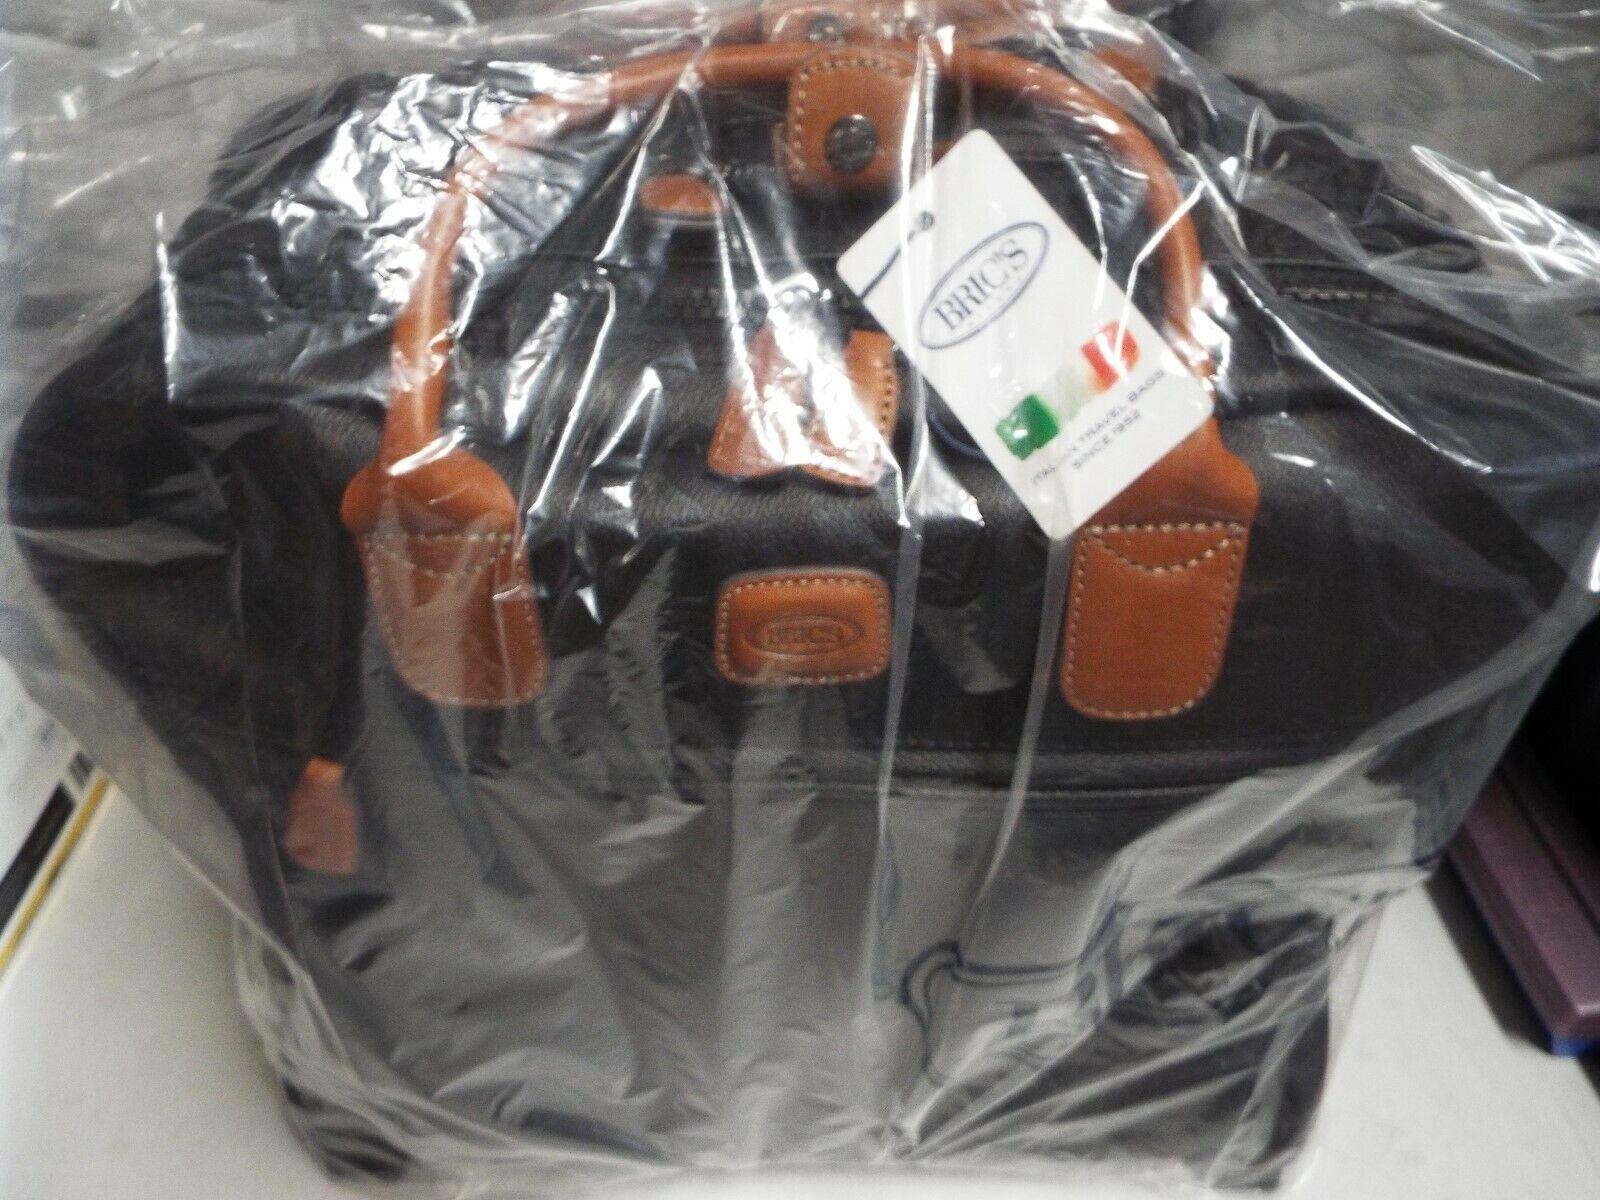 *NIOB* Bric's USA Alba Pilote Underseat Tote Carry-On Luggag